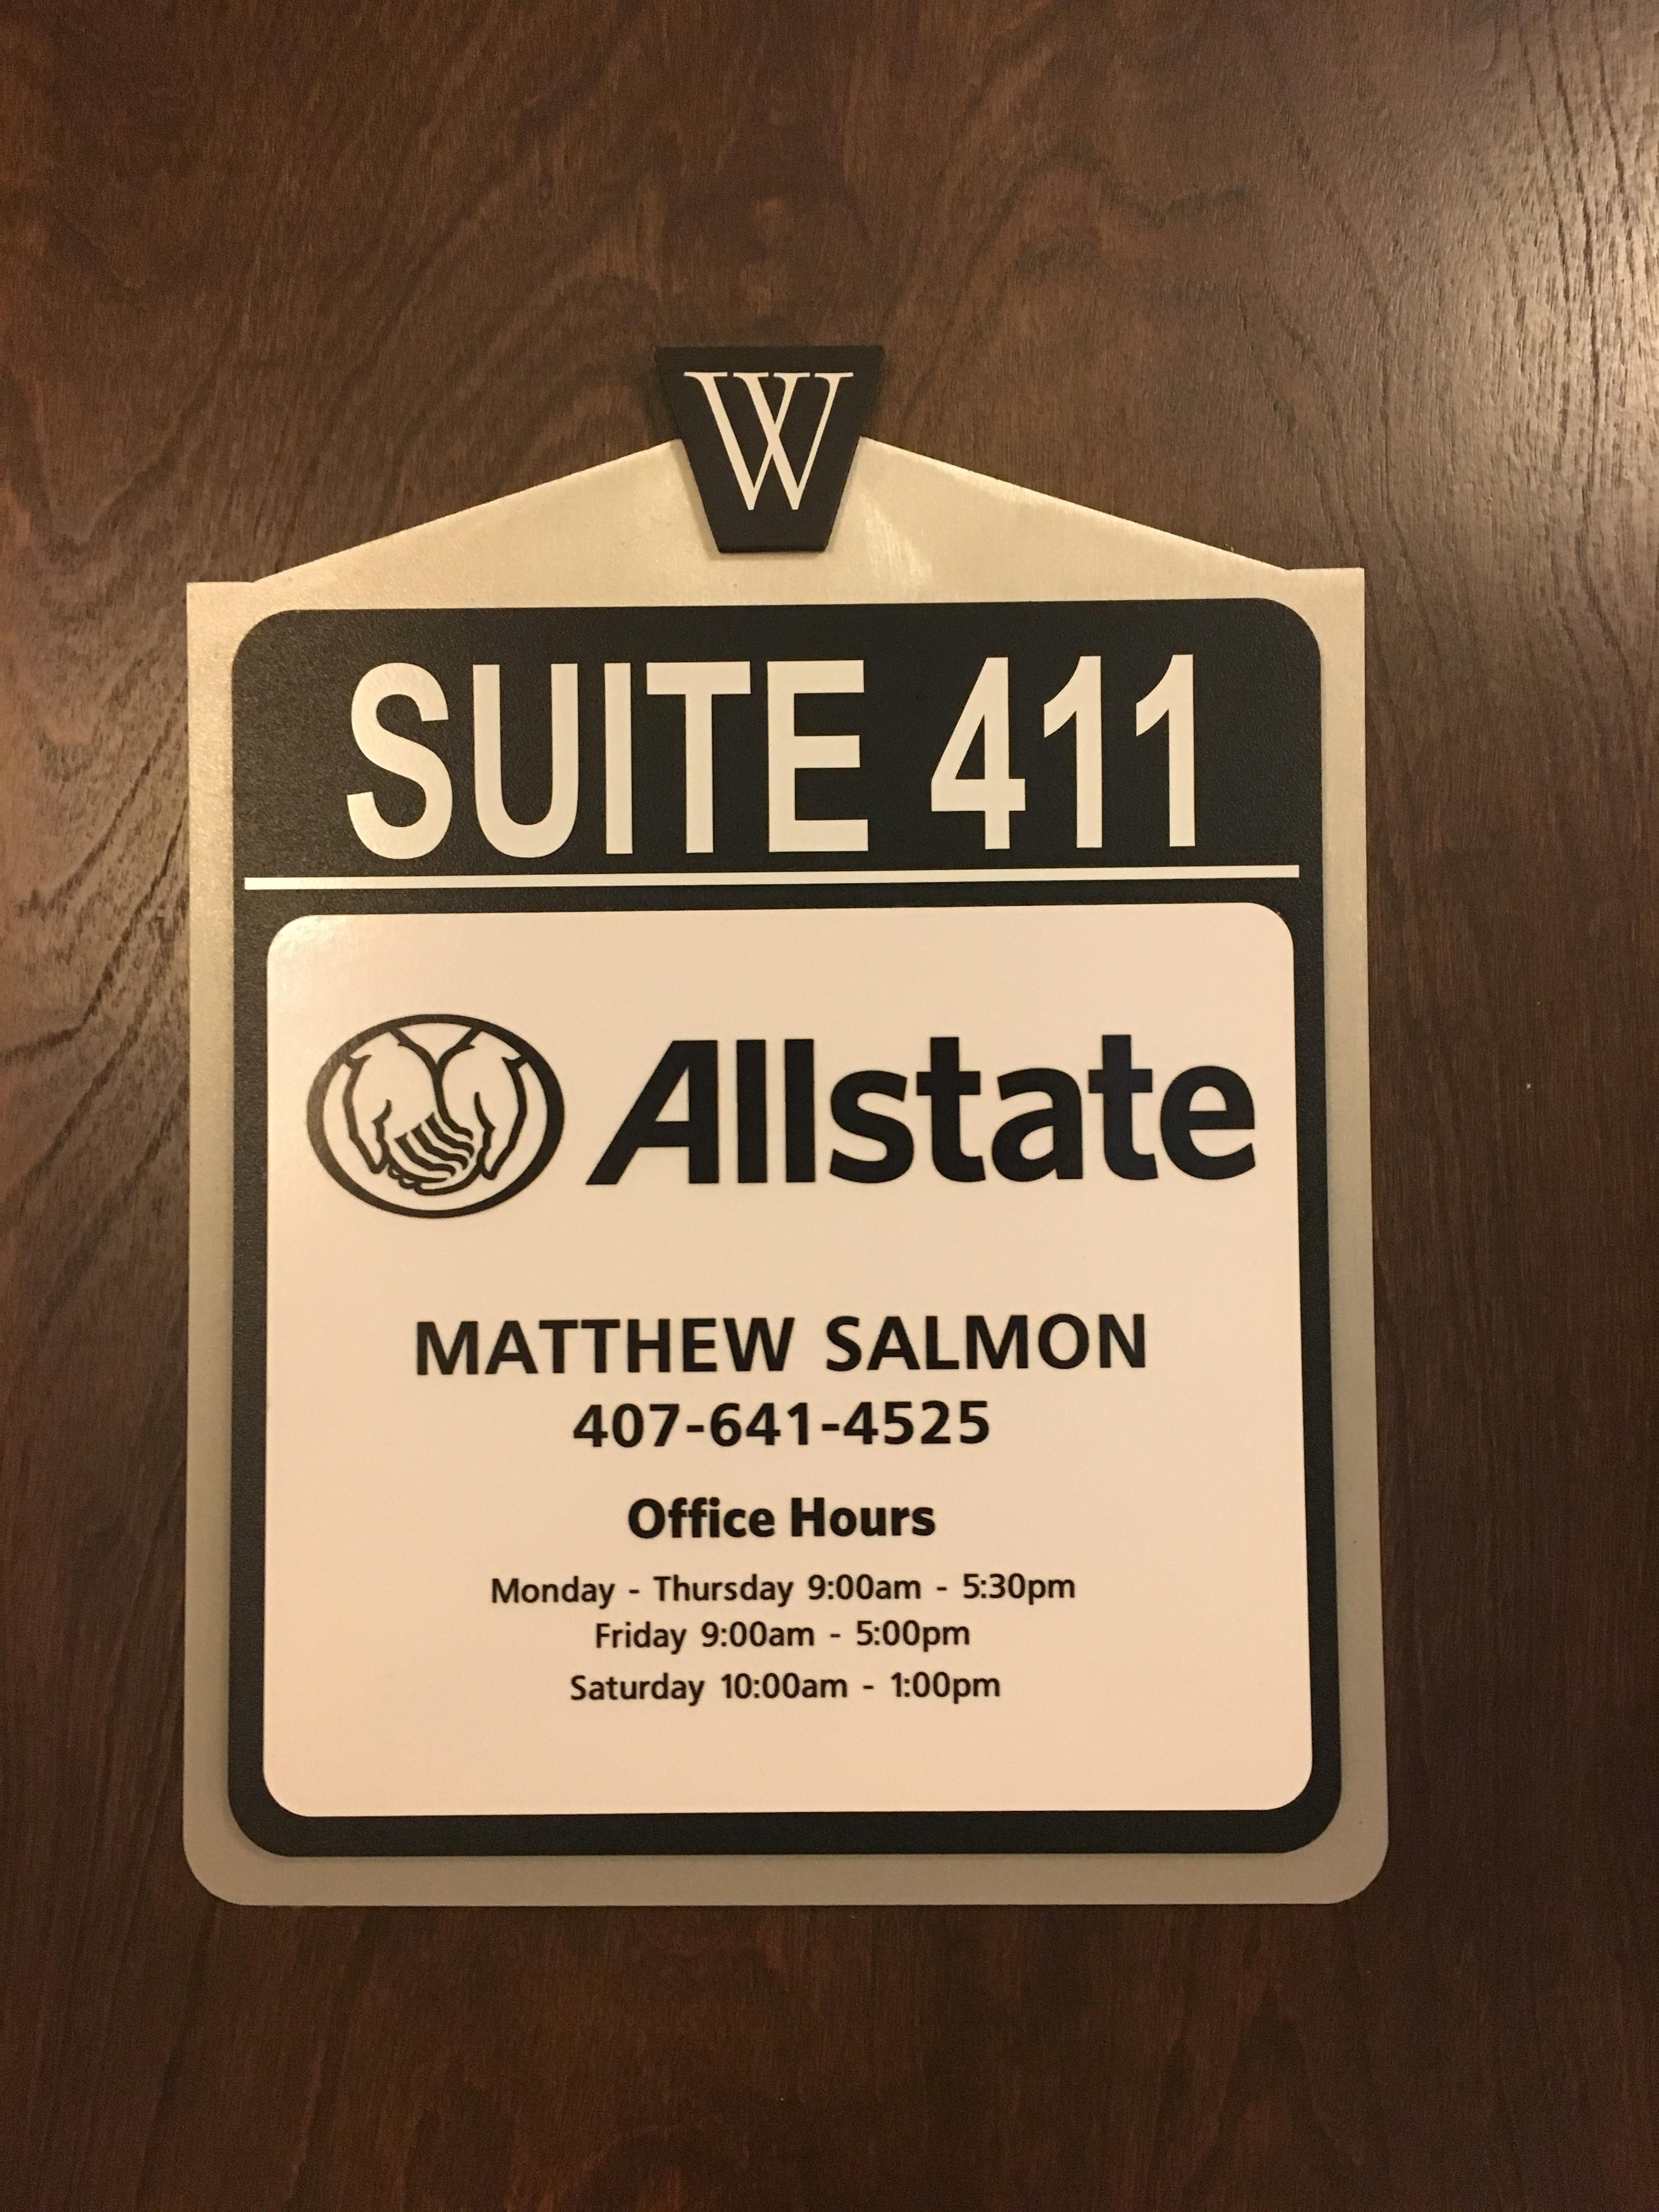 Matthew Salmon: Allstate Insurance image 5